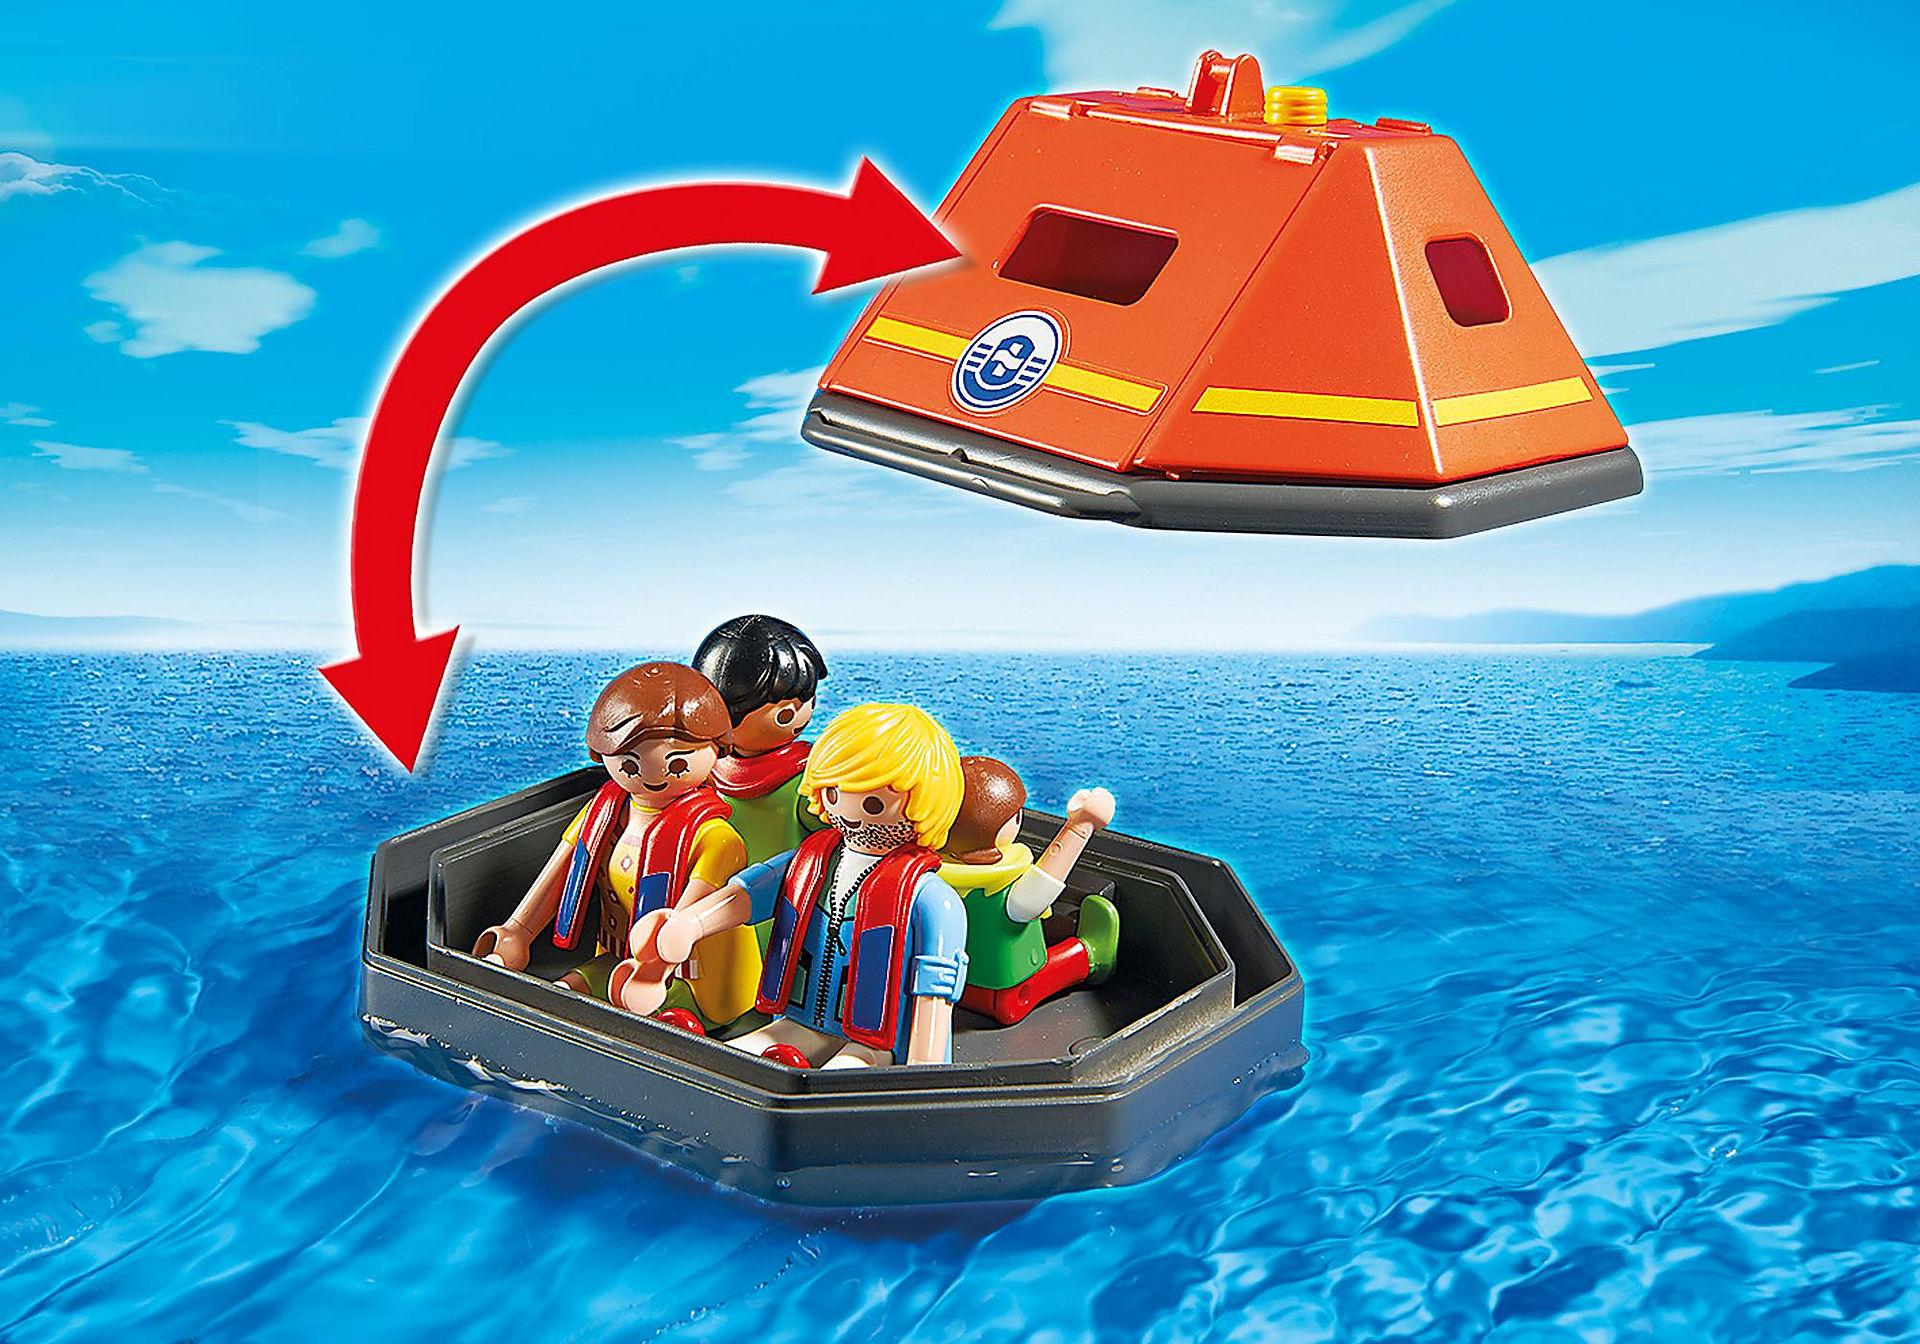 http://media.playmobil.com/i/playmobil/5545_product_extra1/Rettungsinsel